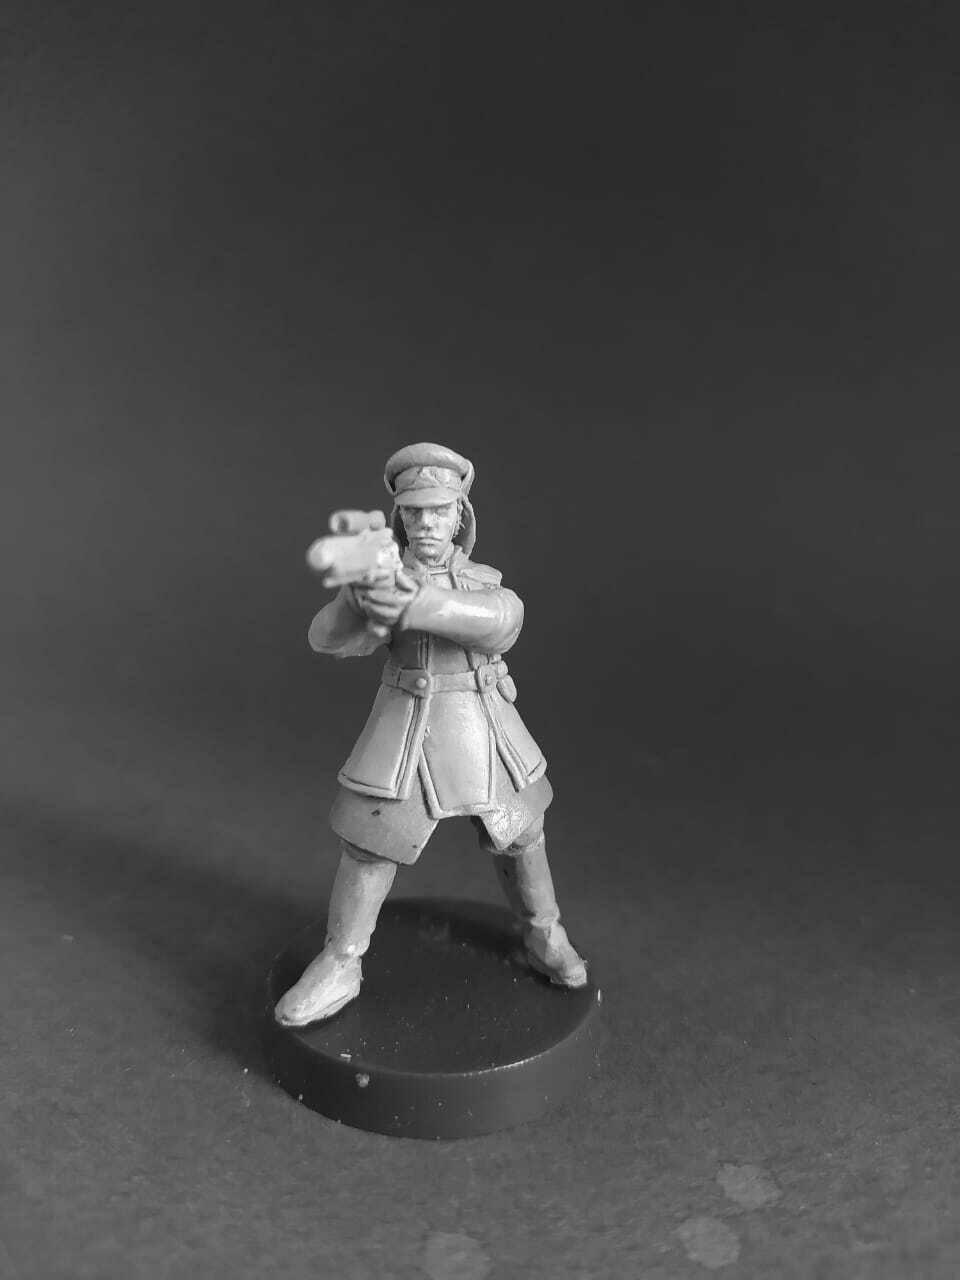 Guard Naboo. Captain Quarsh Panaka